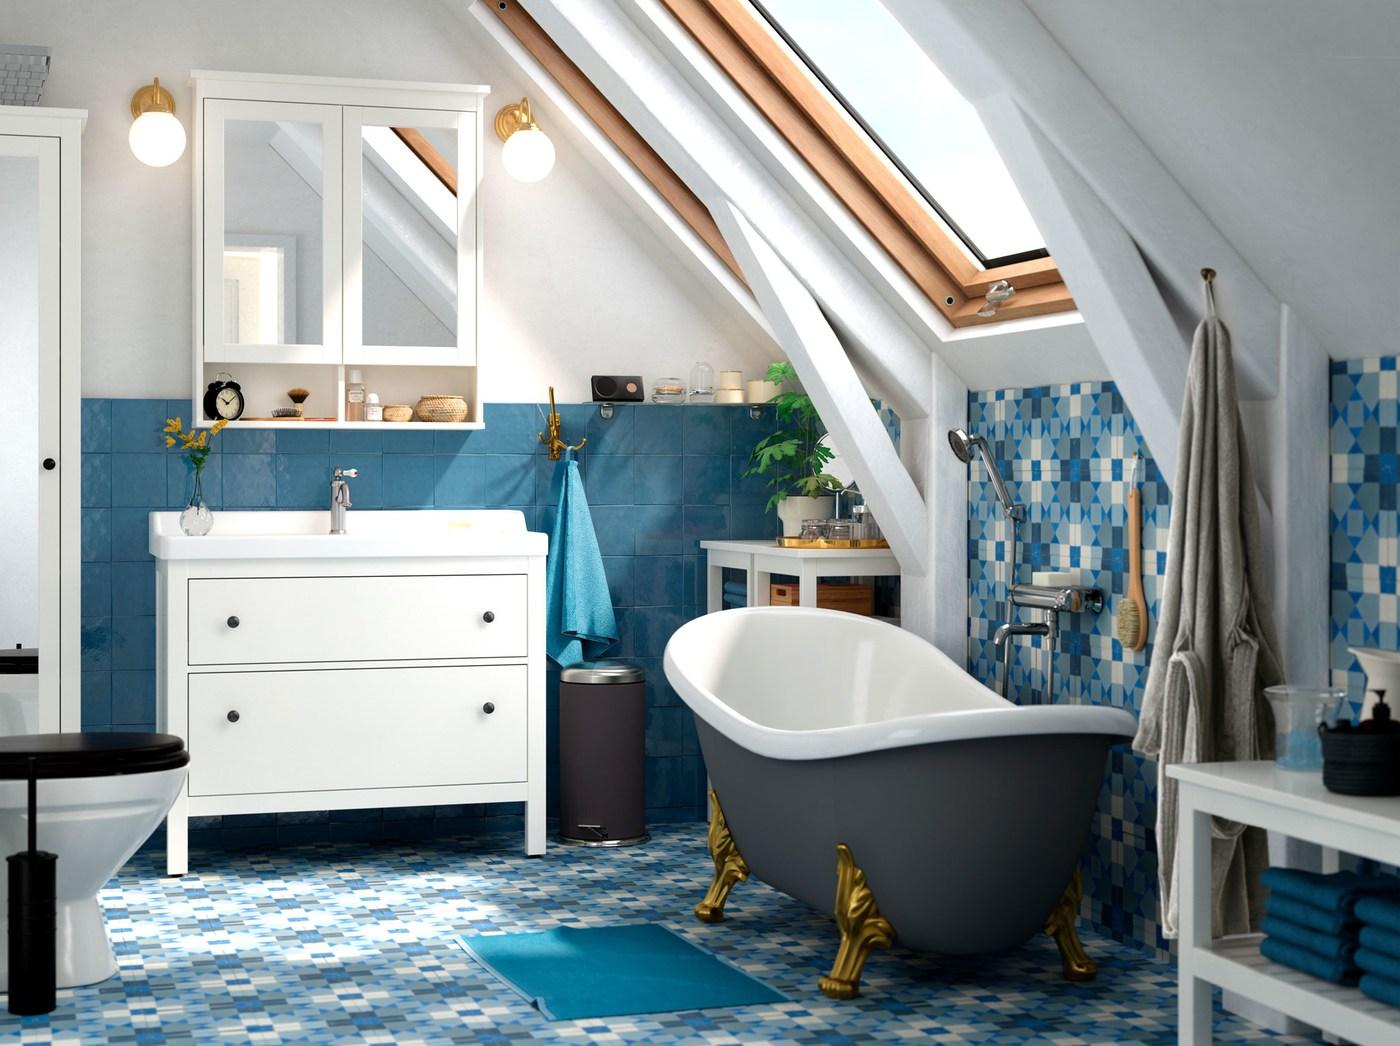 Gentil Bathroom Design Ideas Gallery   IKEA